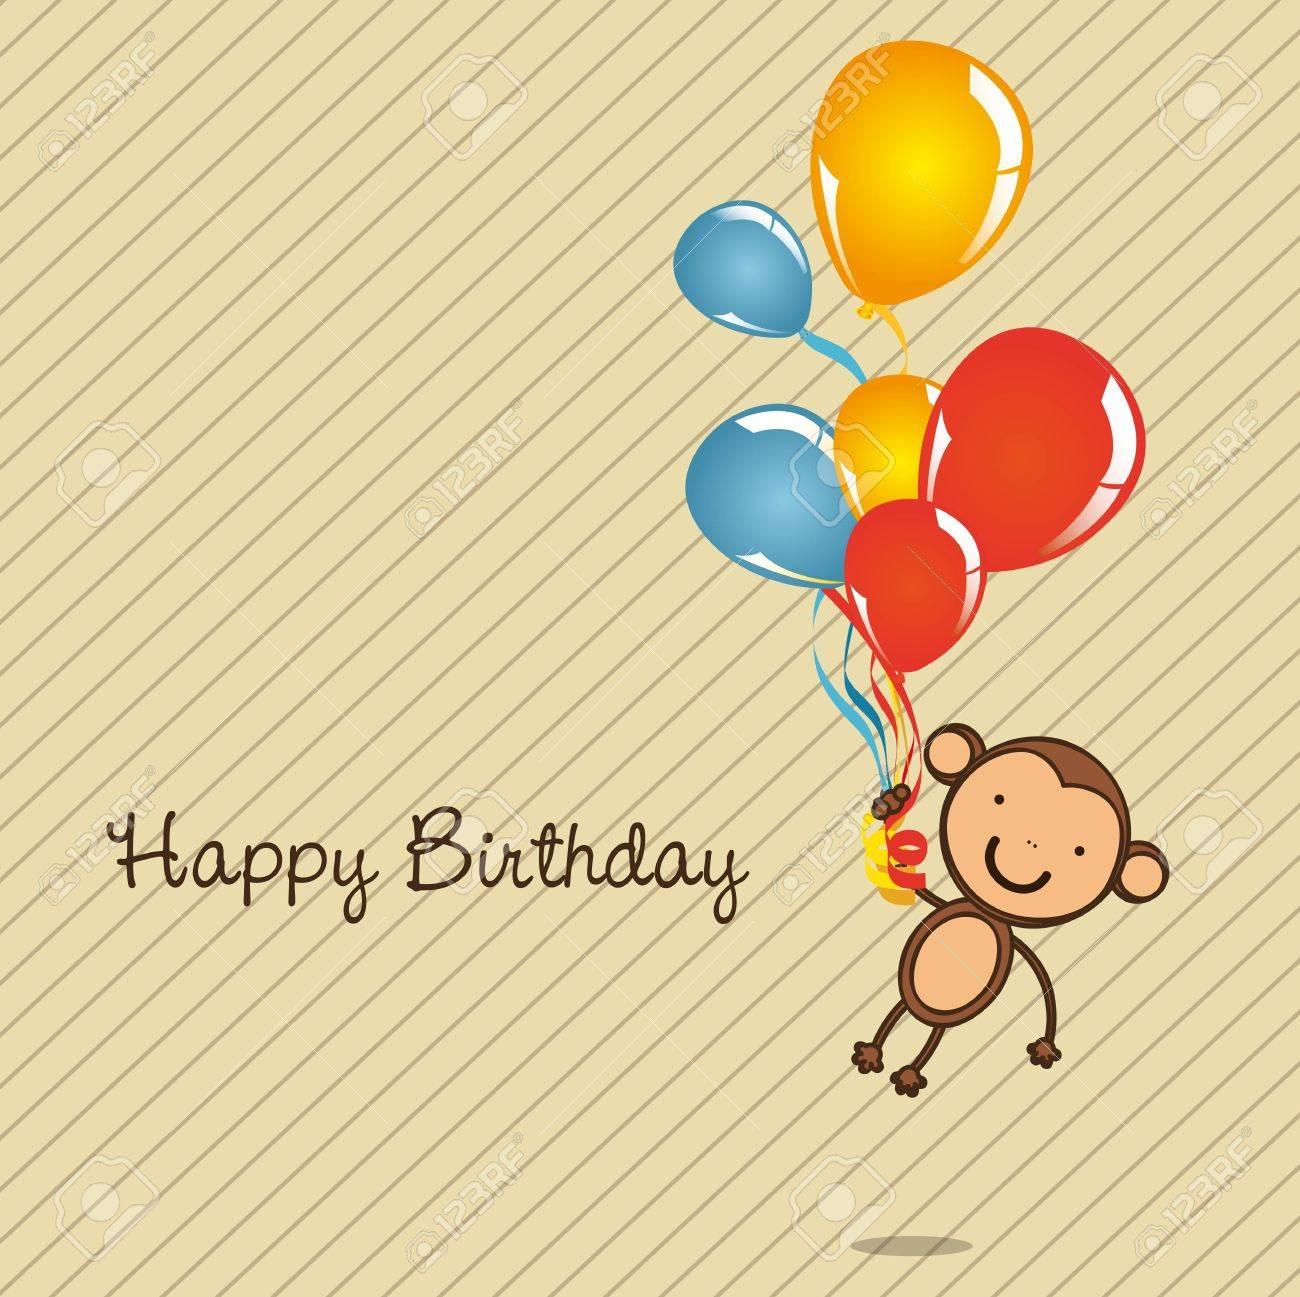 Monkey Birthday Card With Balloons Vector Illustration Stock